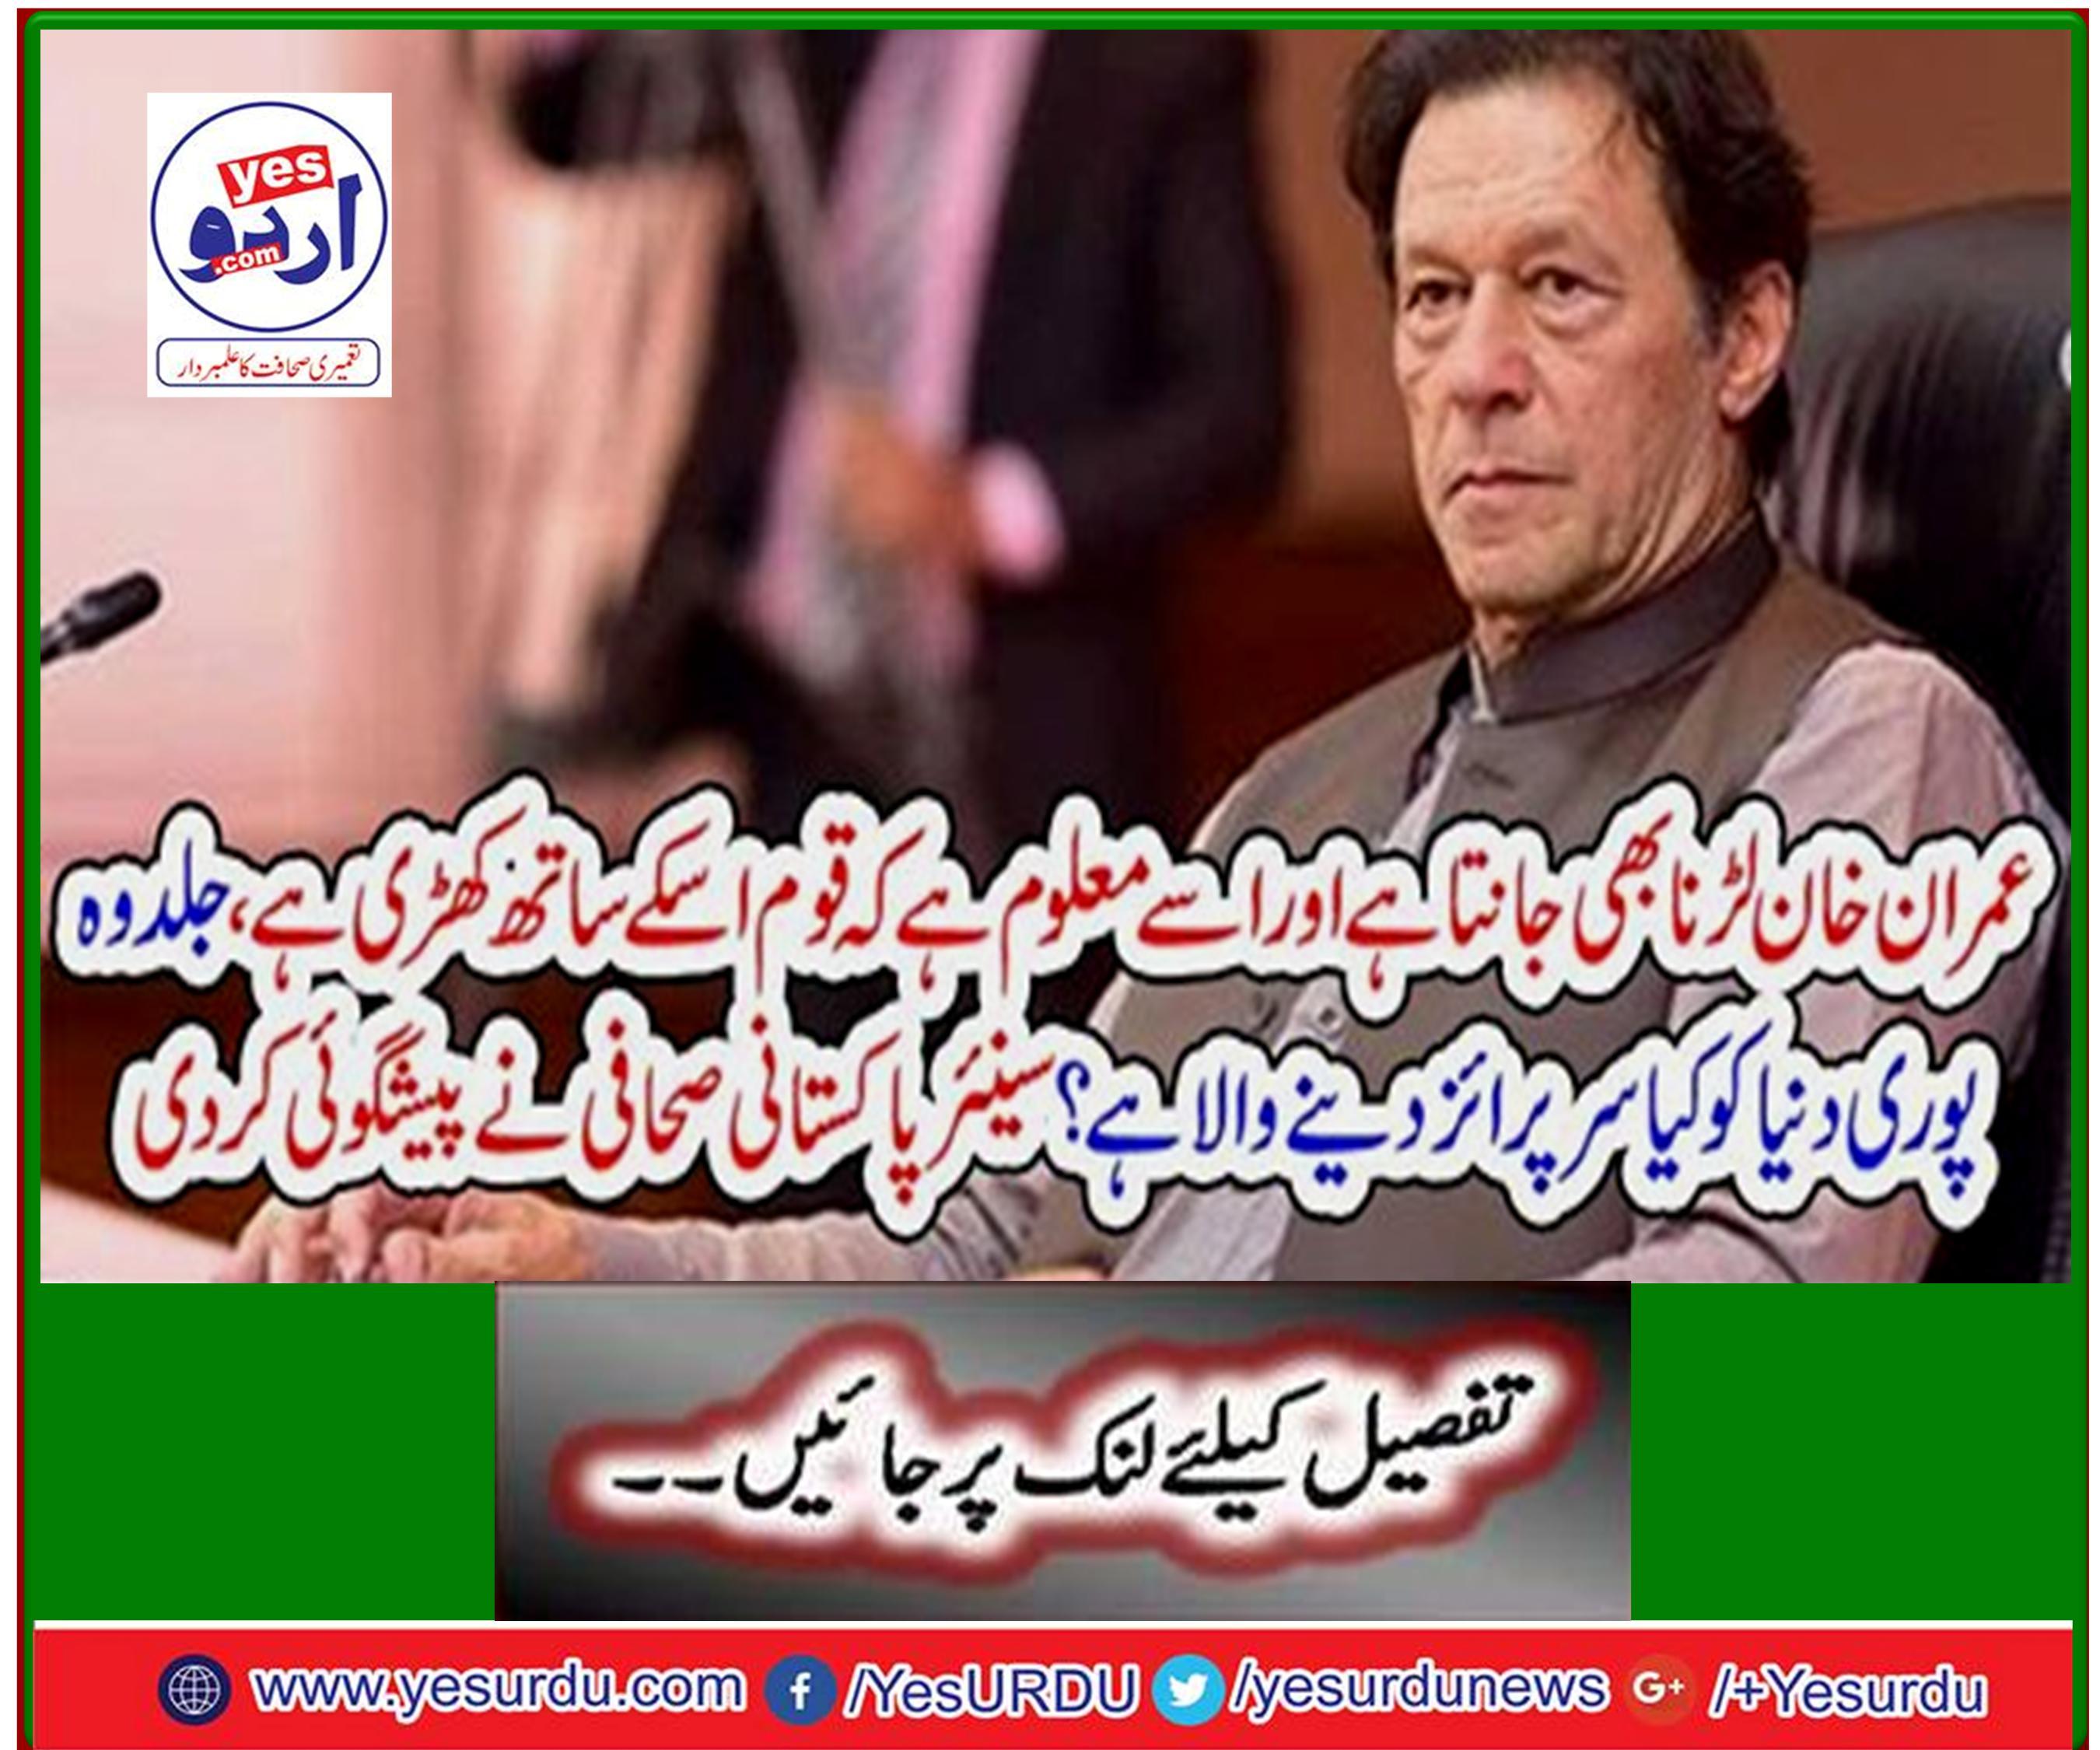 Senior Pakistani journalist predicted